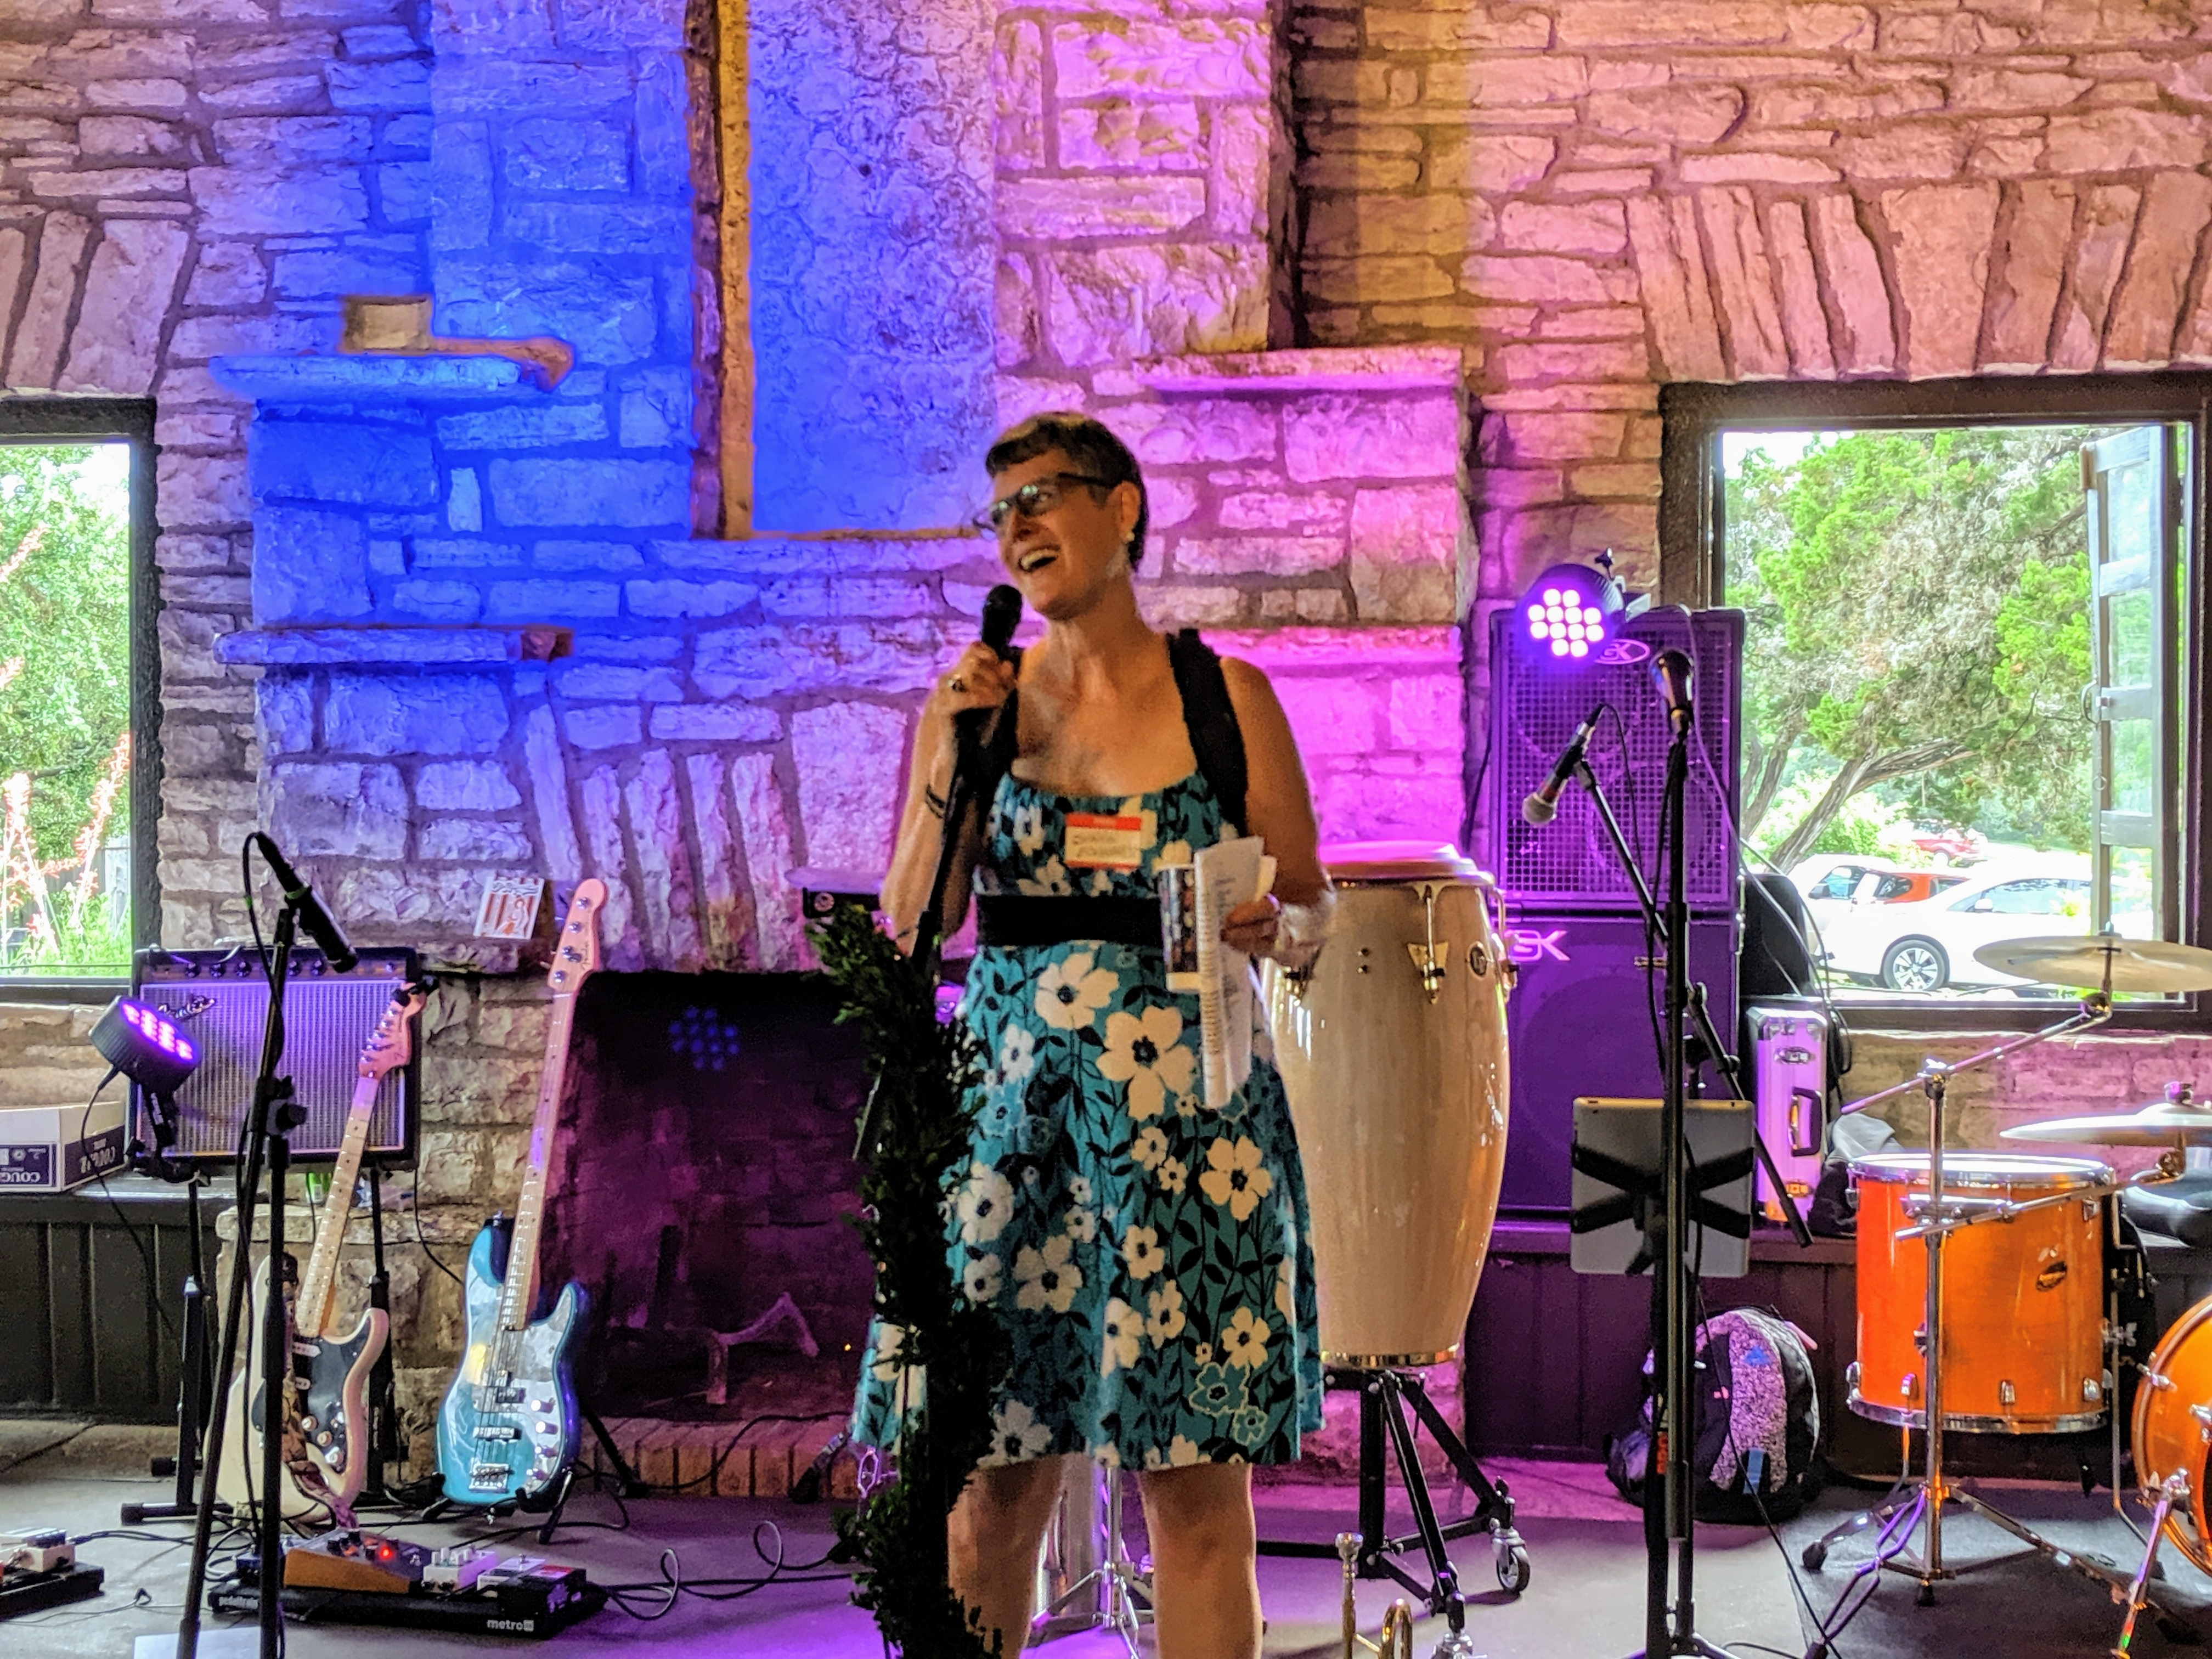 Sarah Eckhardt speaking at Spring for Water 2019